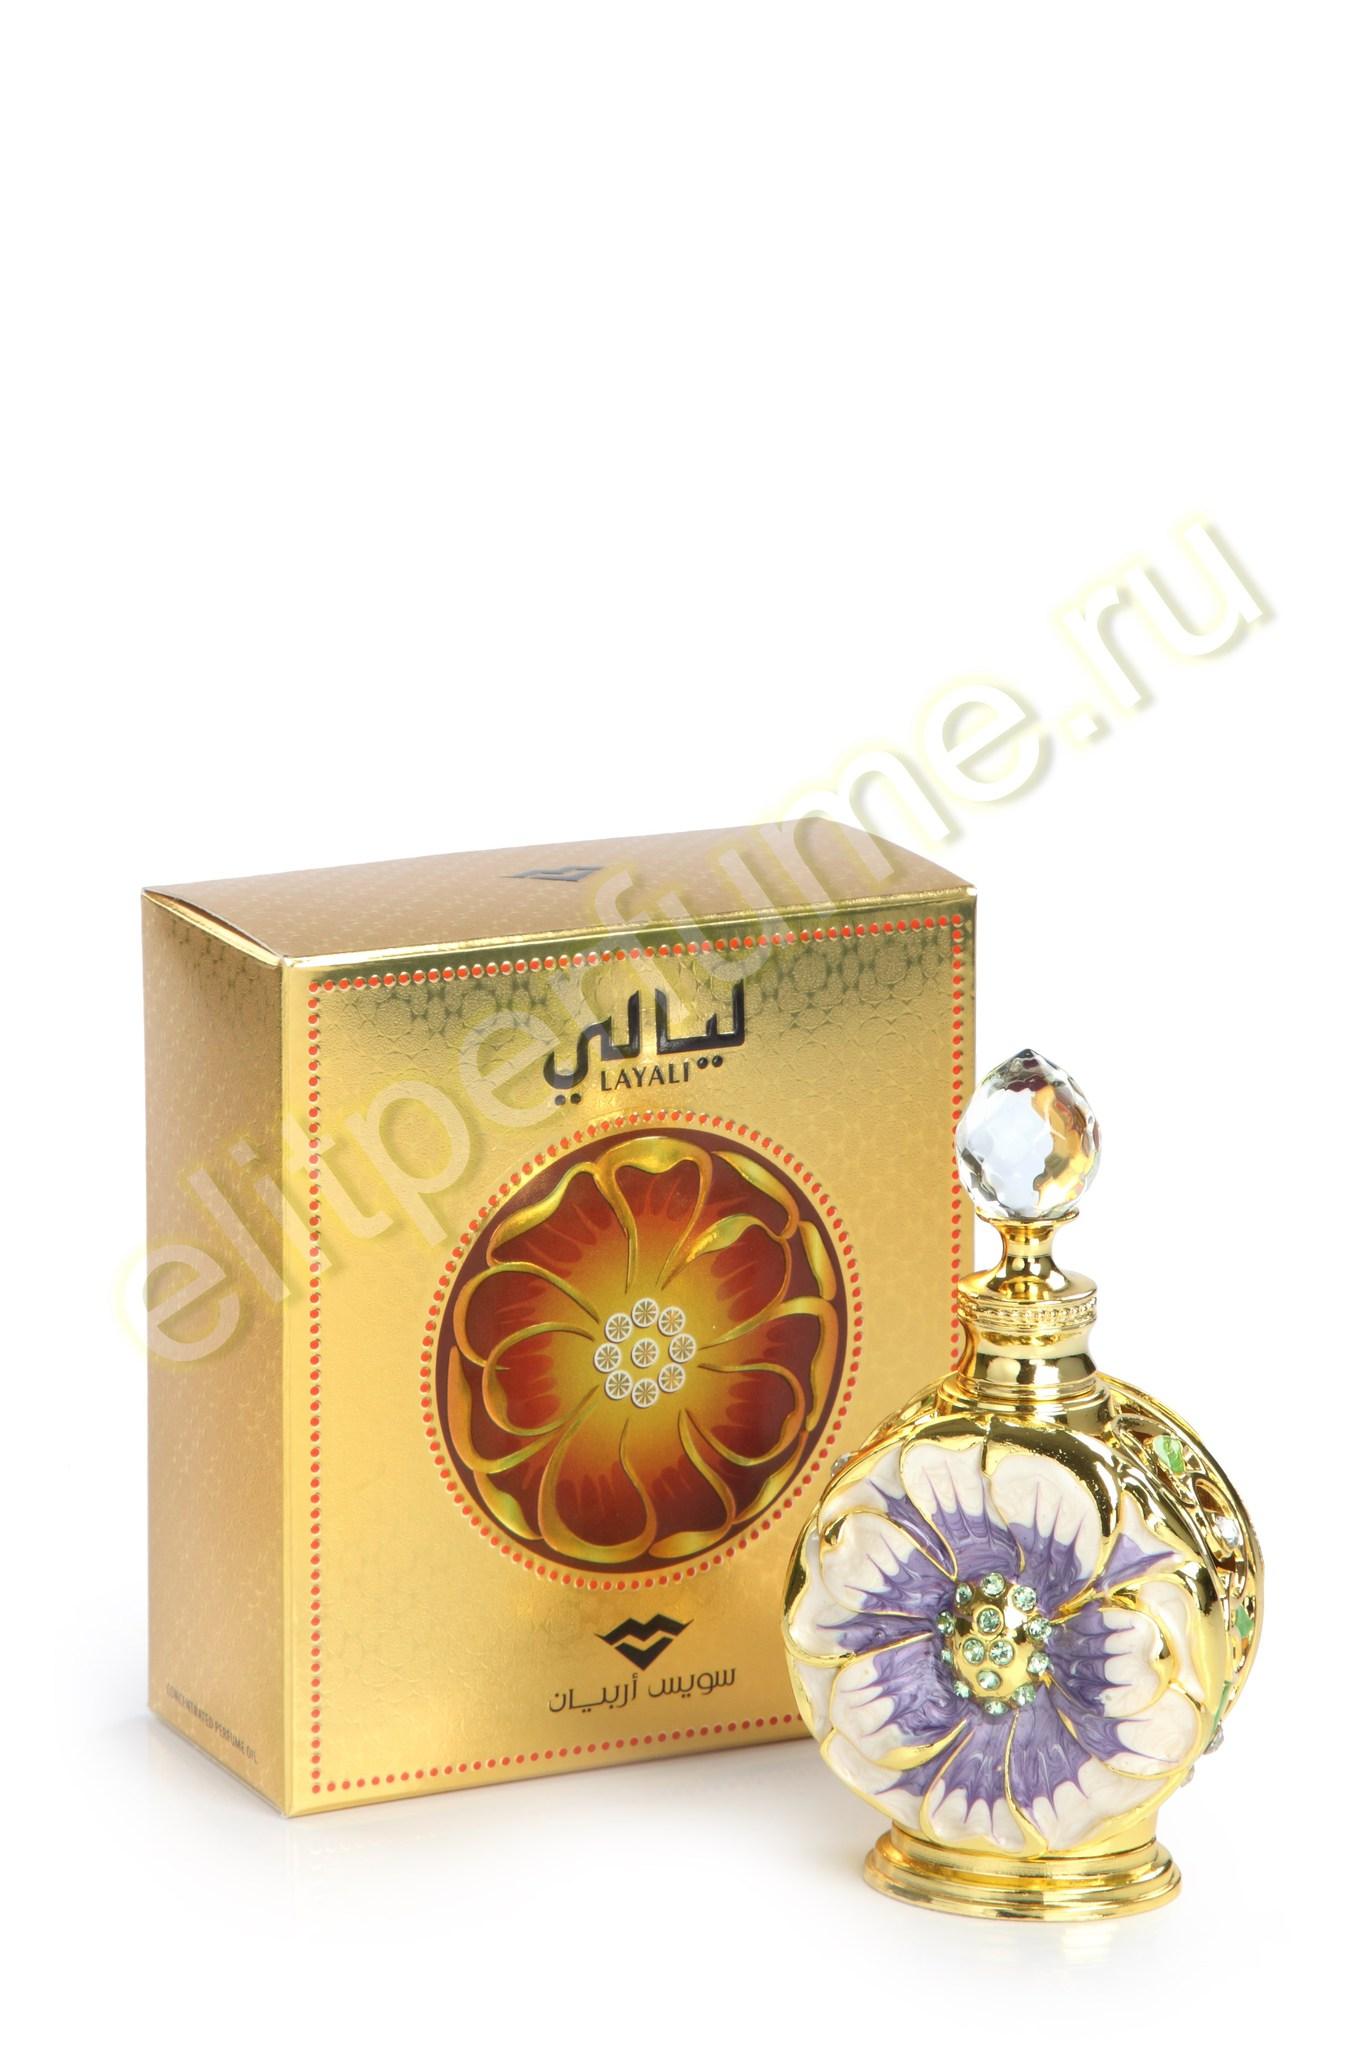 Layali Лаяли 15 мл арабские масляные духи от Свисс Арабиан Swiss Arabian